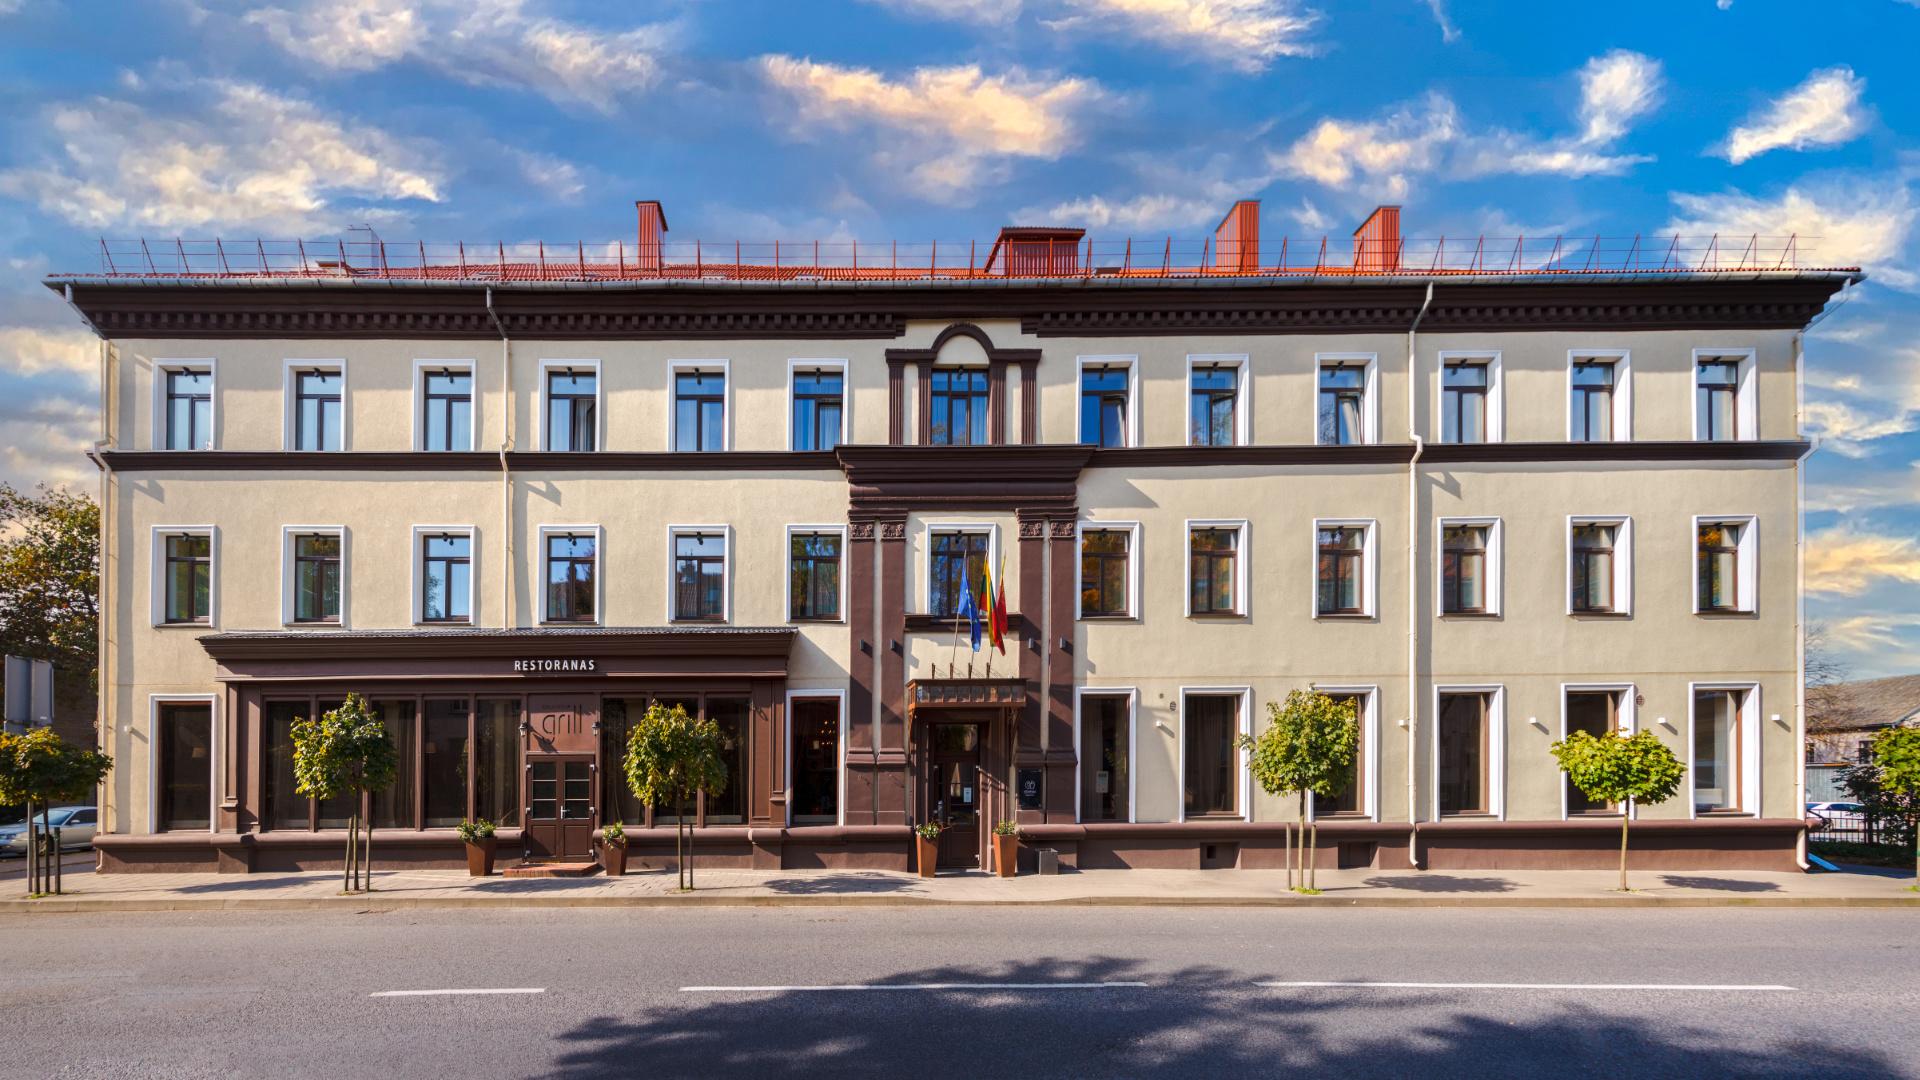 Bohema. Hotel in Klaipeda. Galinio Pylimo g. 16, Klaipėda